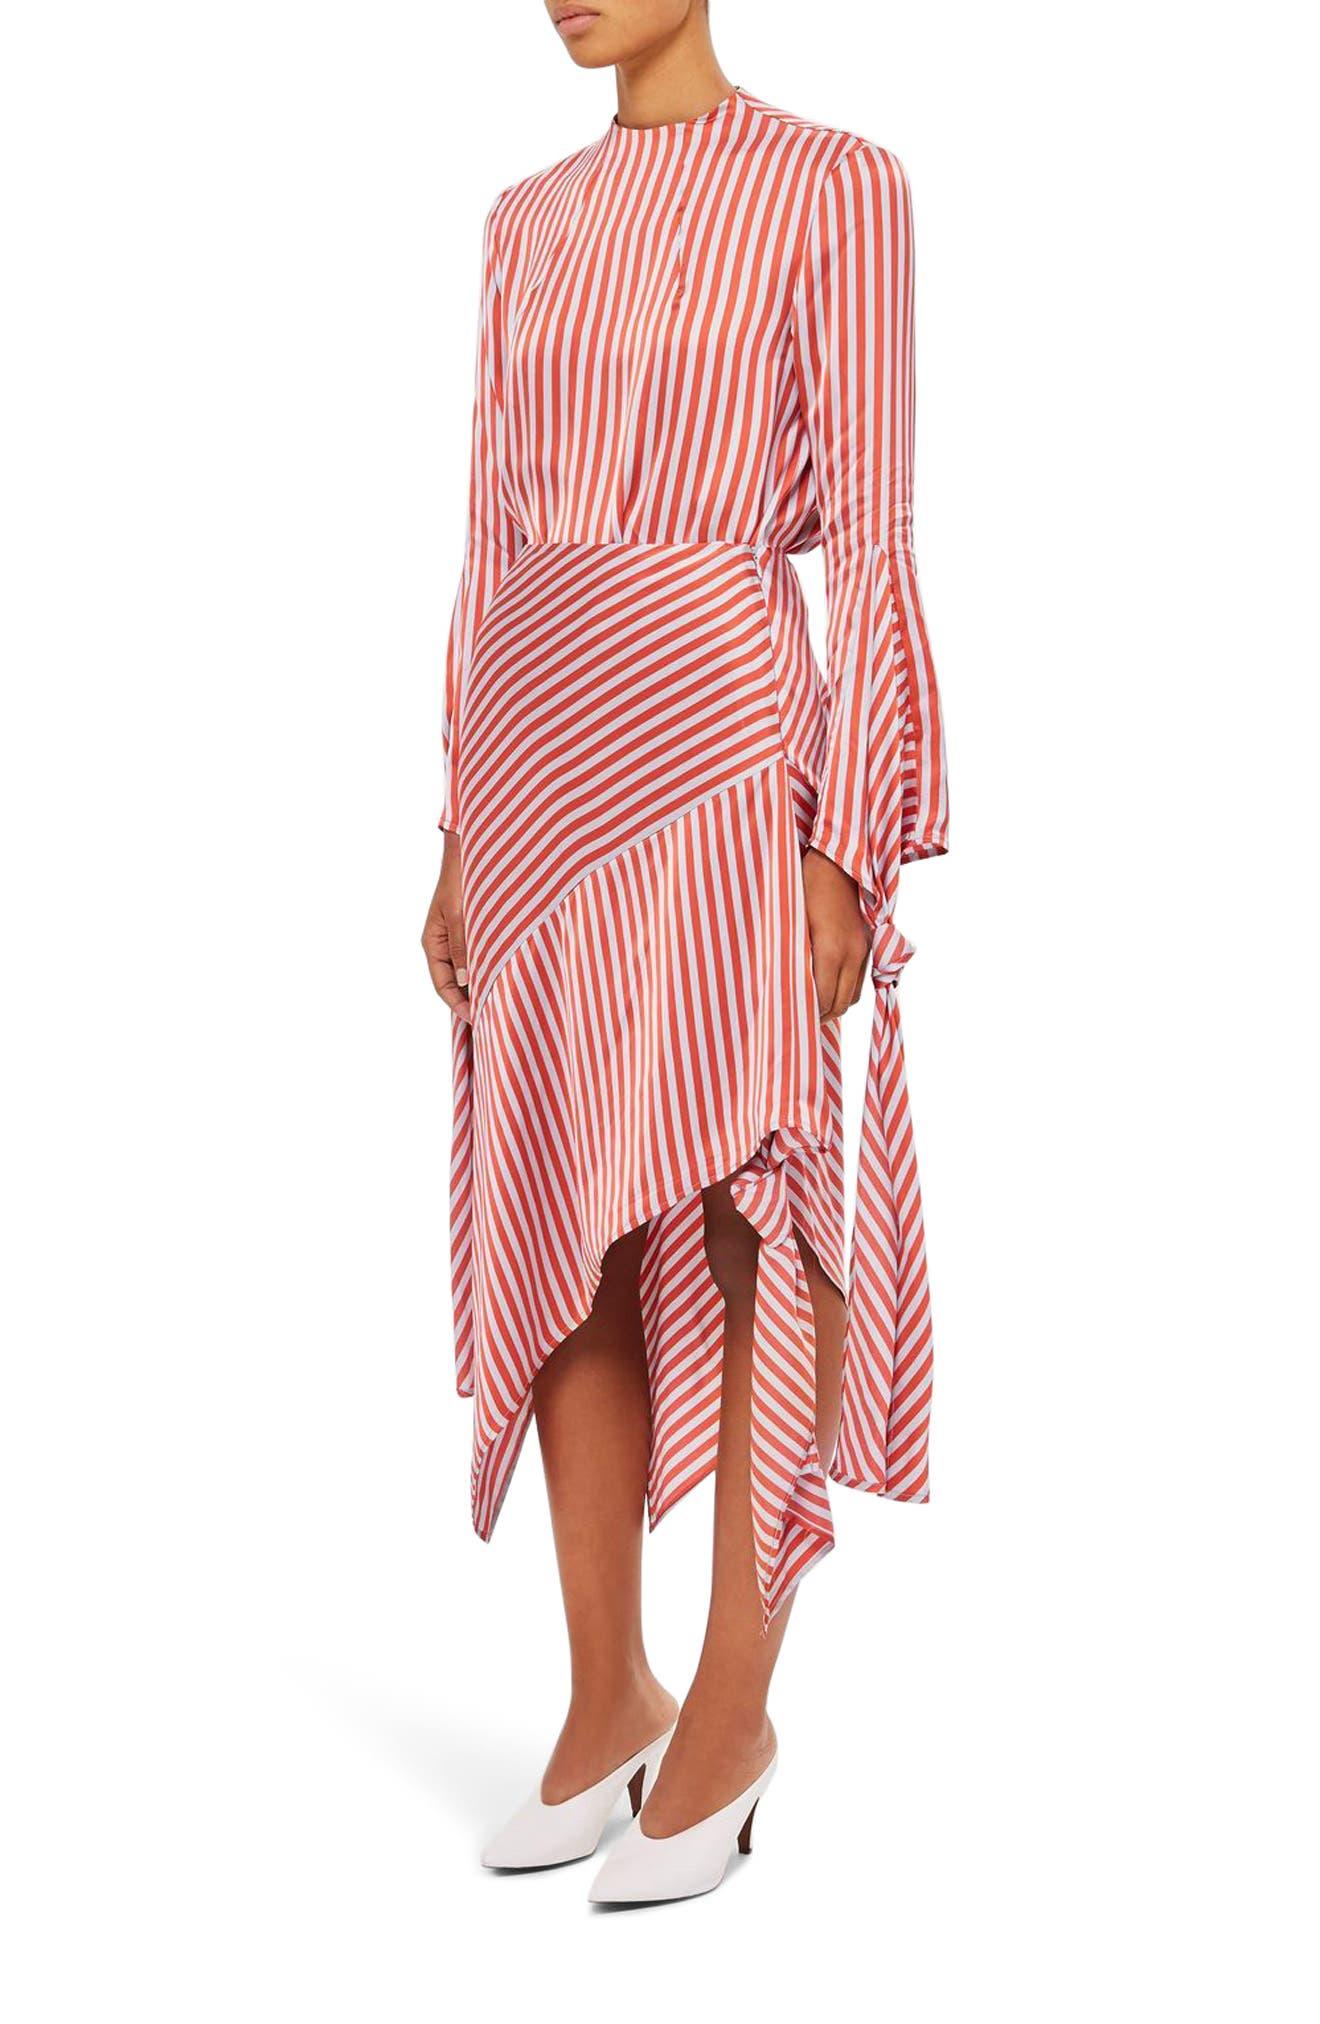 Main Image - Topshop Boutique Stripe Knot Midi Skirt